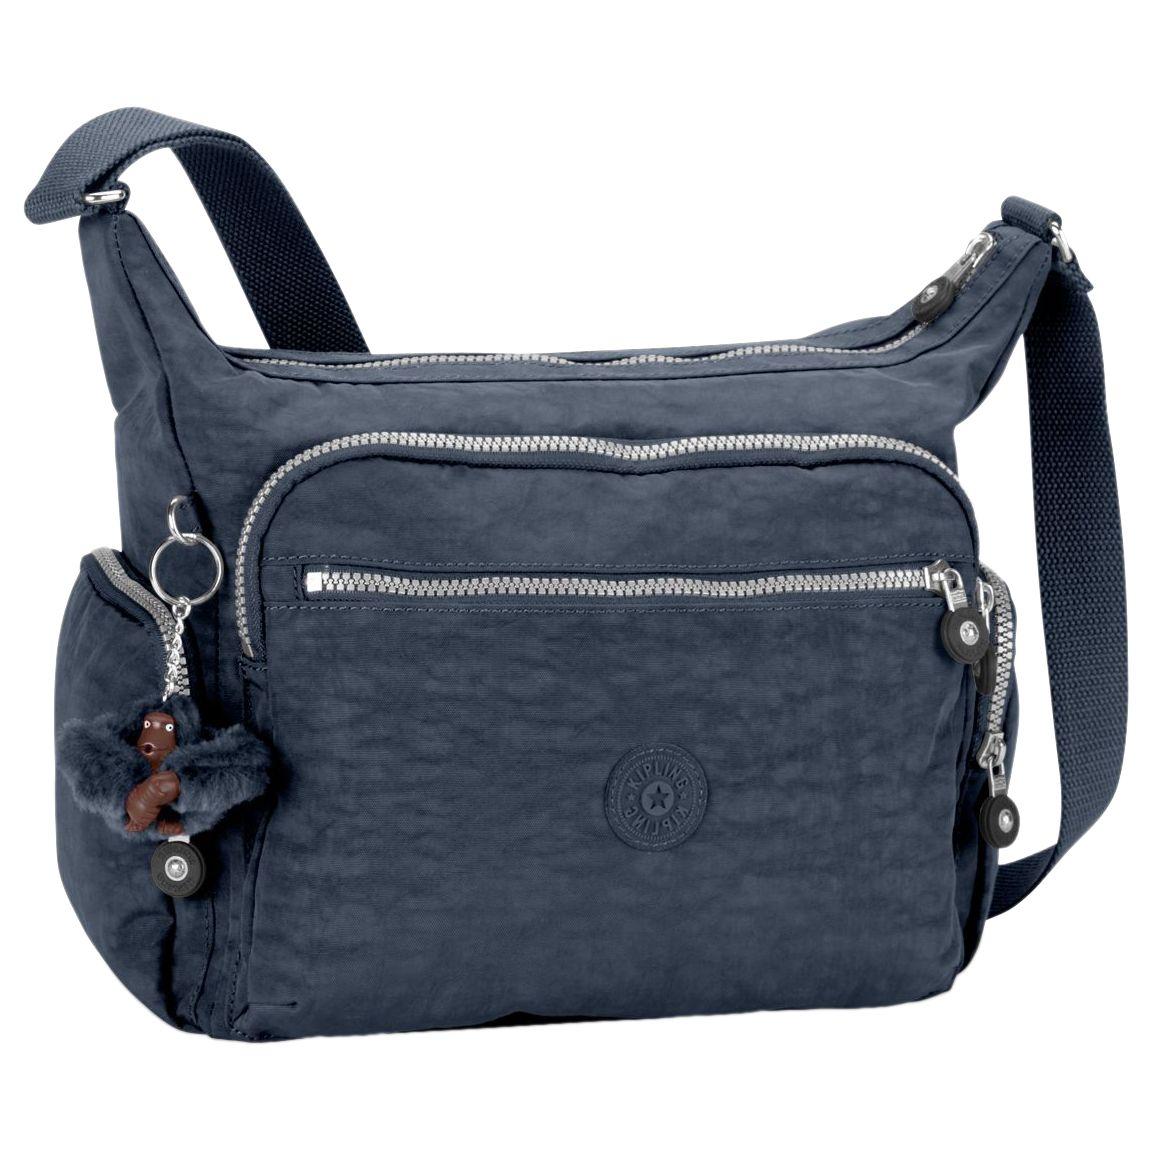 f1f32d96f0 Kipling Gabbie Medium Shoulder Bag at John Lewis & Partners